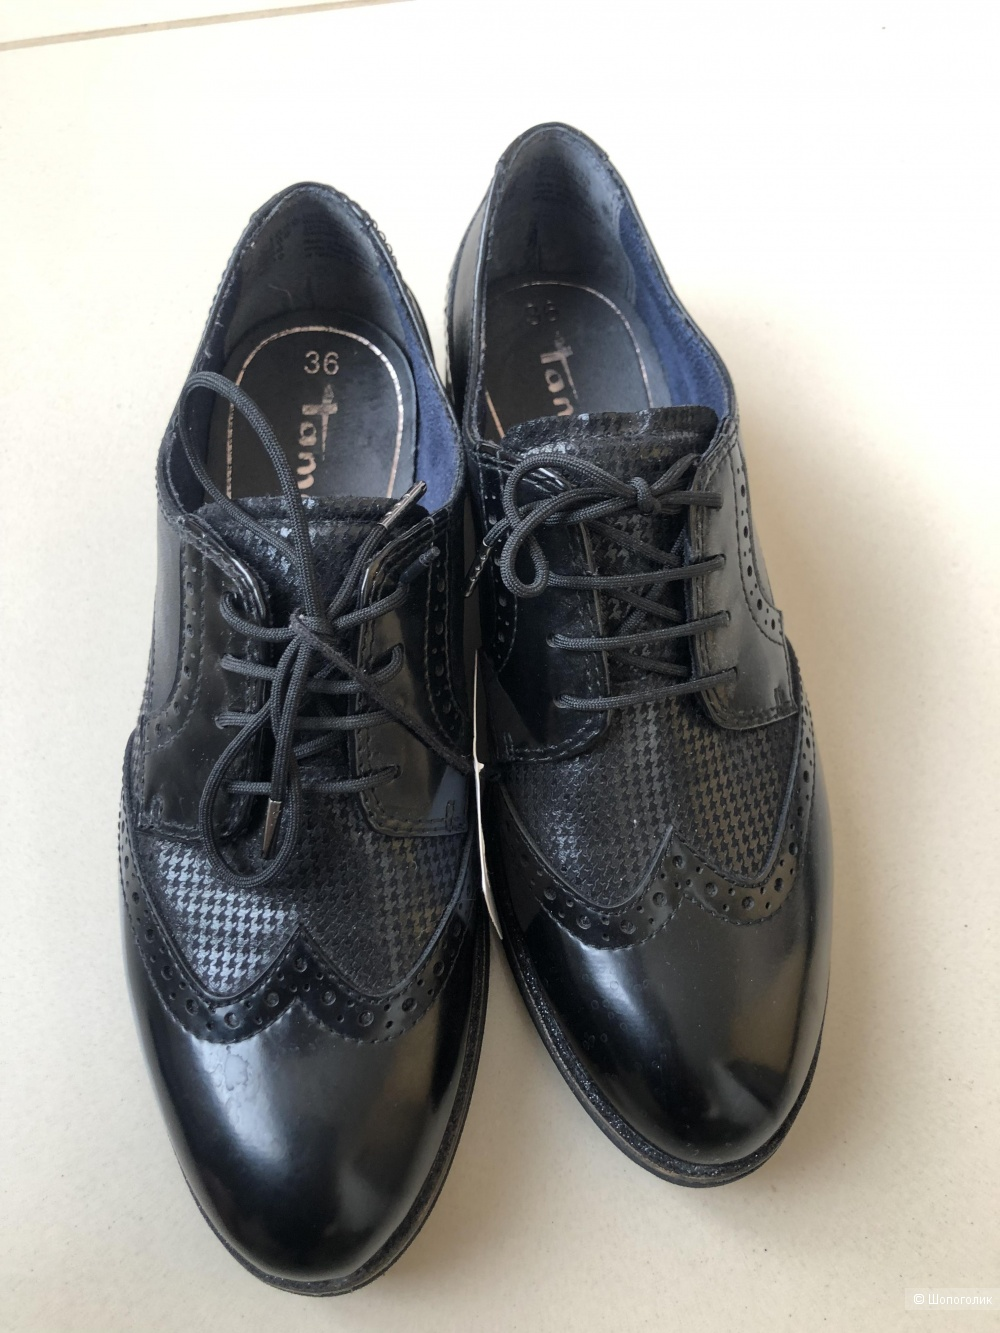 Ботинки-Оксфорды Tamaris 36 размер